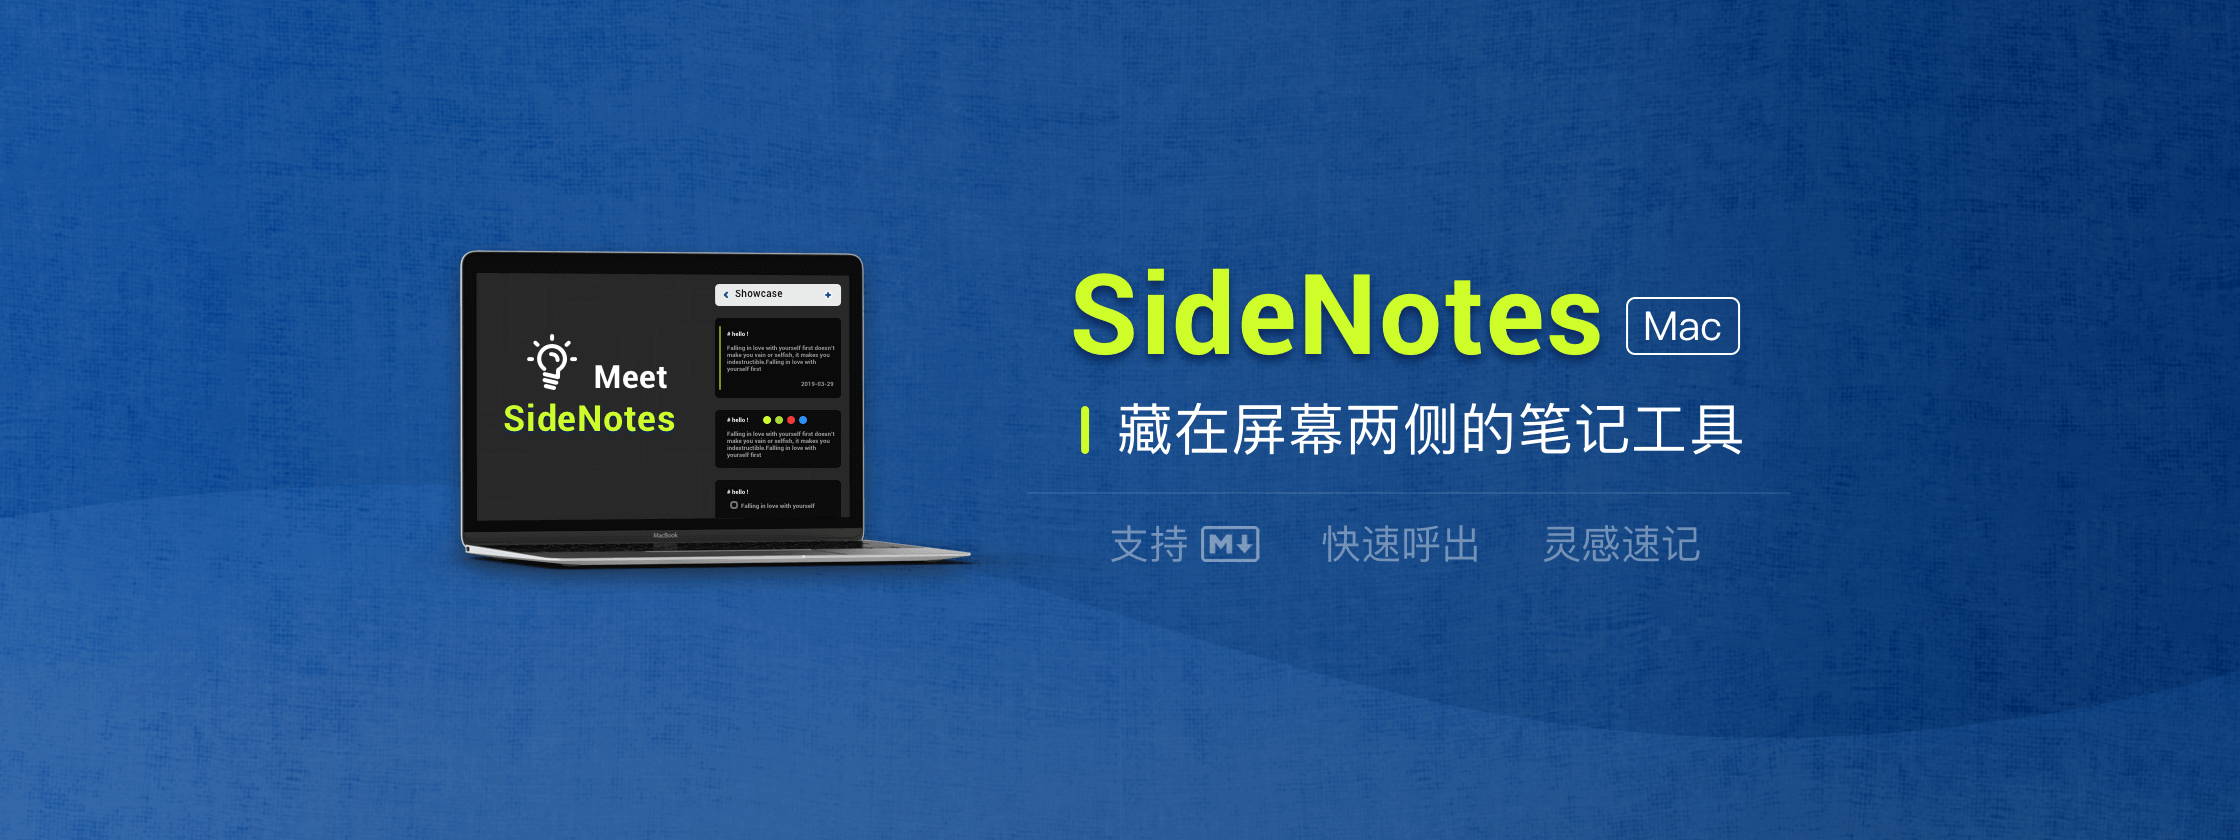 SideNotes – 藏在屏幕两侧的笔记工具